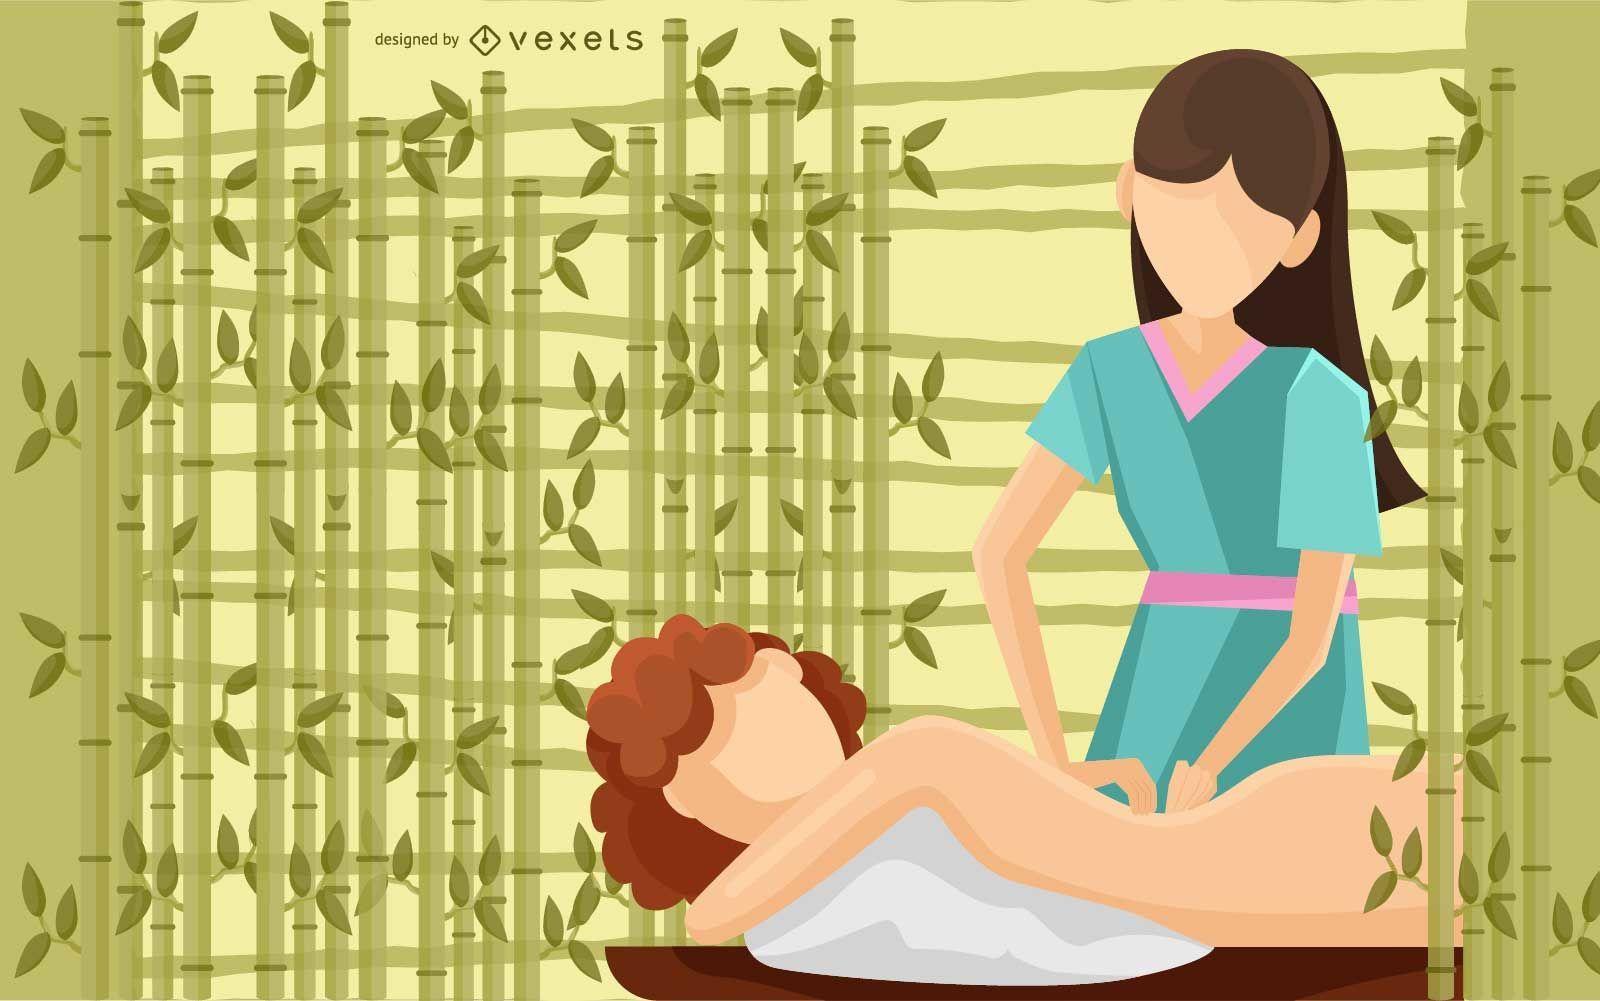 Spa Body Massage Illustration